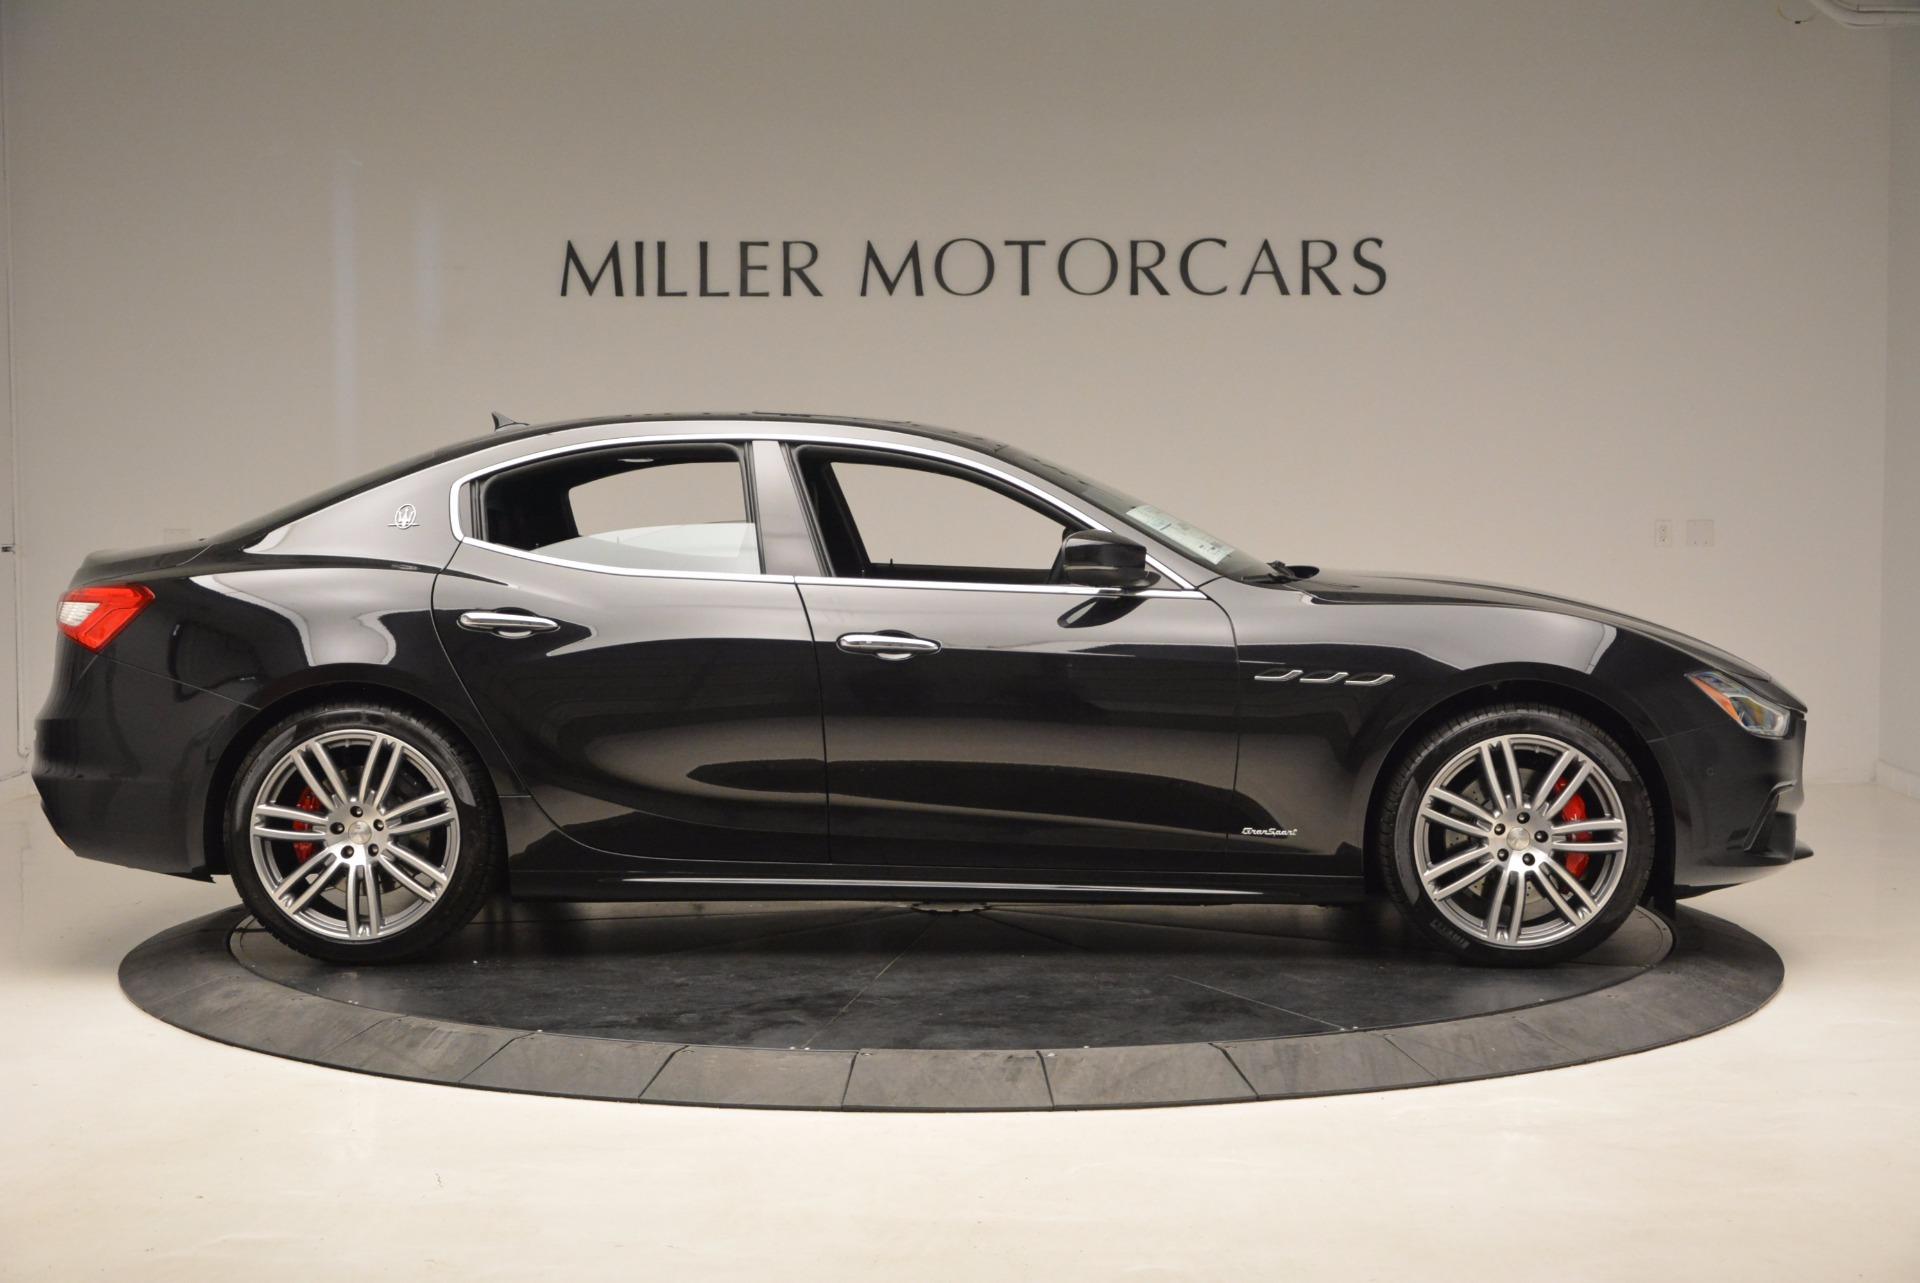 New 2018 Maserati Ghibli S Q4 GranSport For Sale 0 In Greenwich, CT